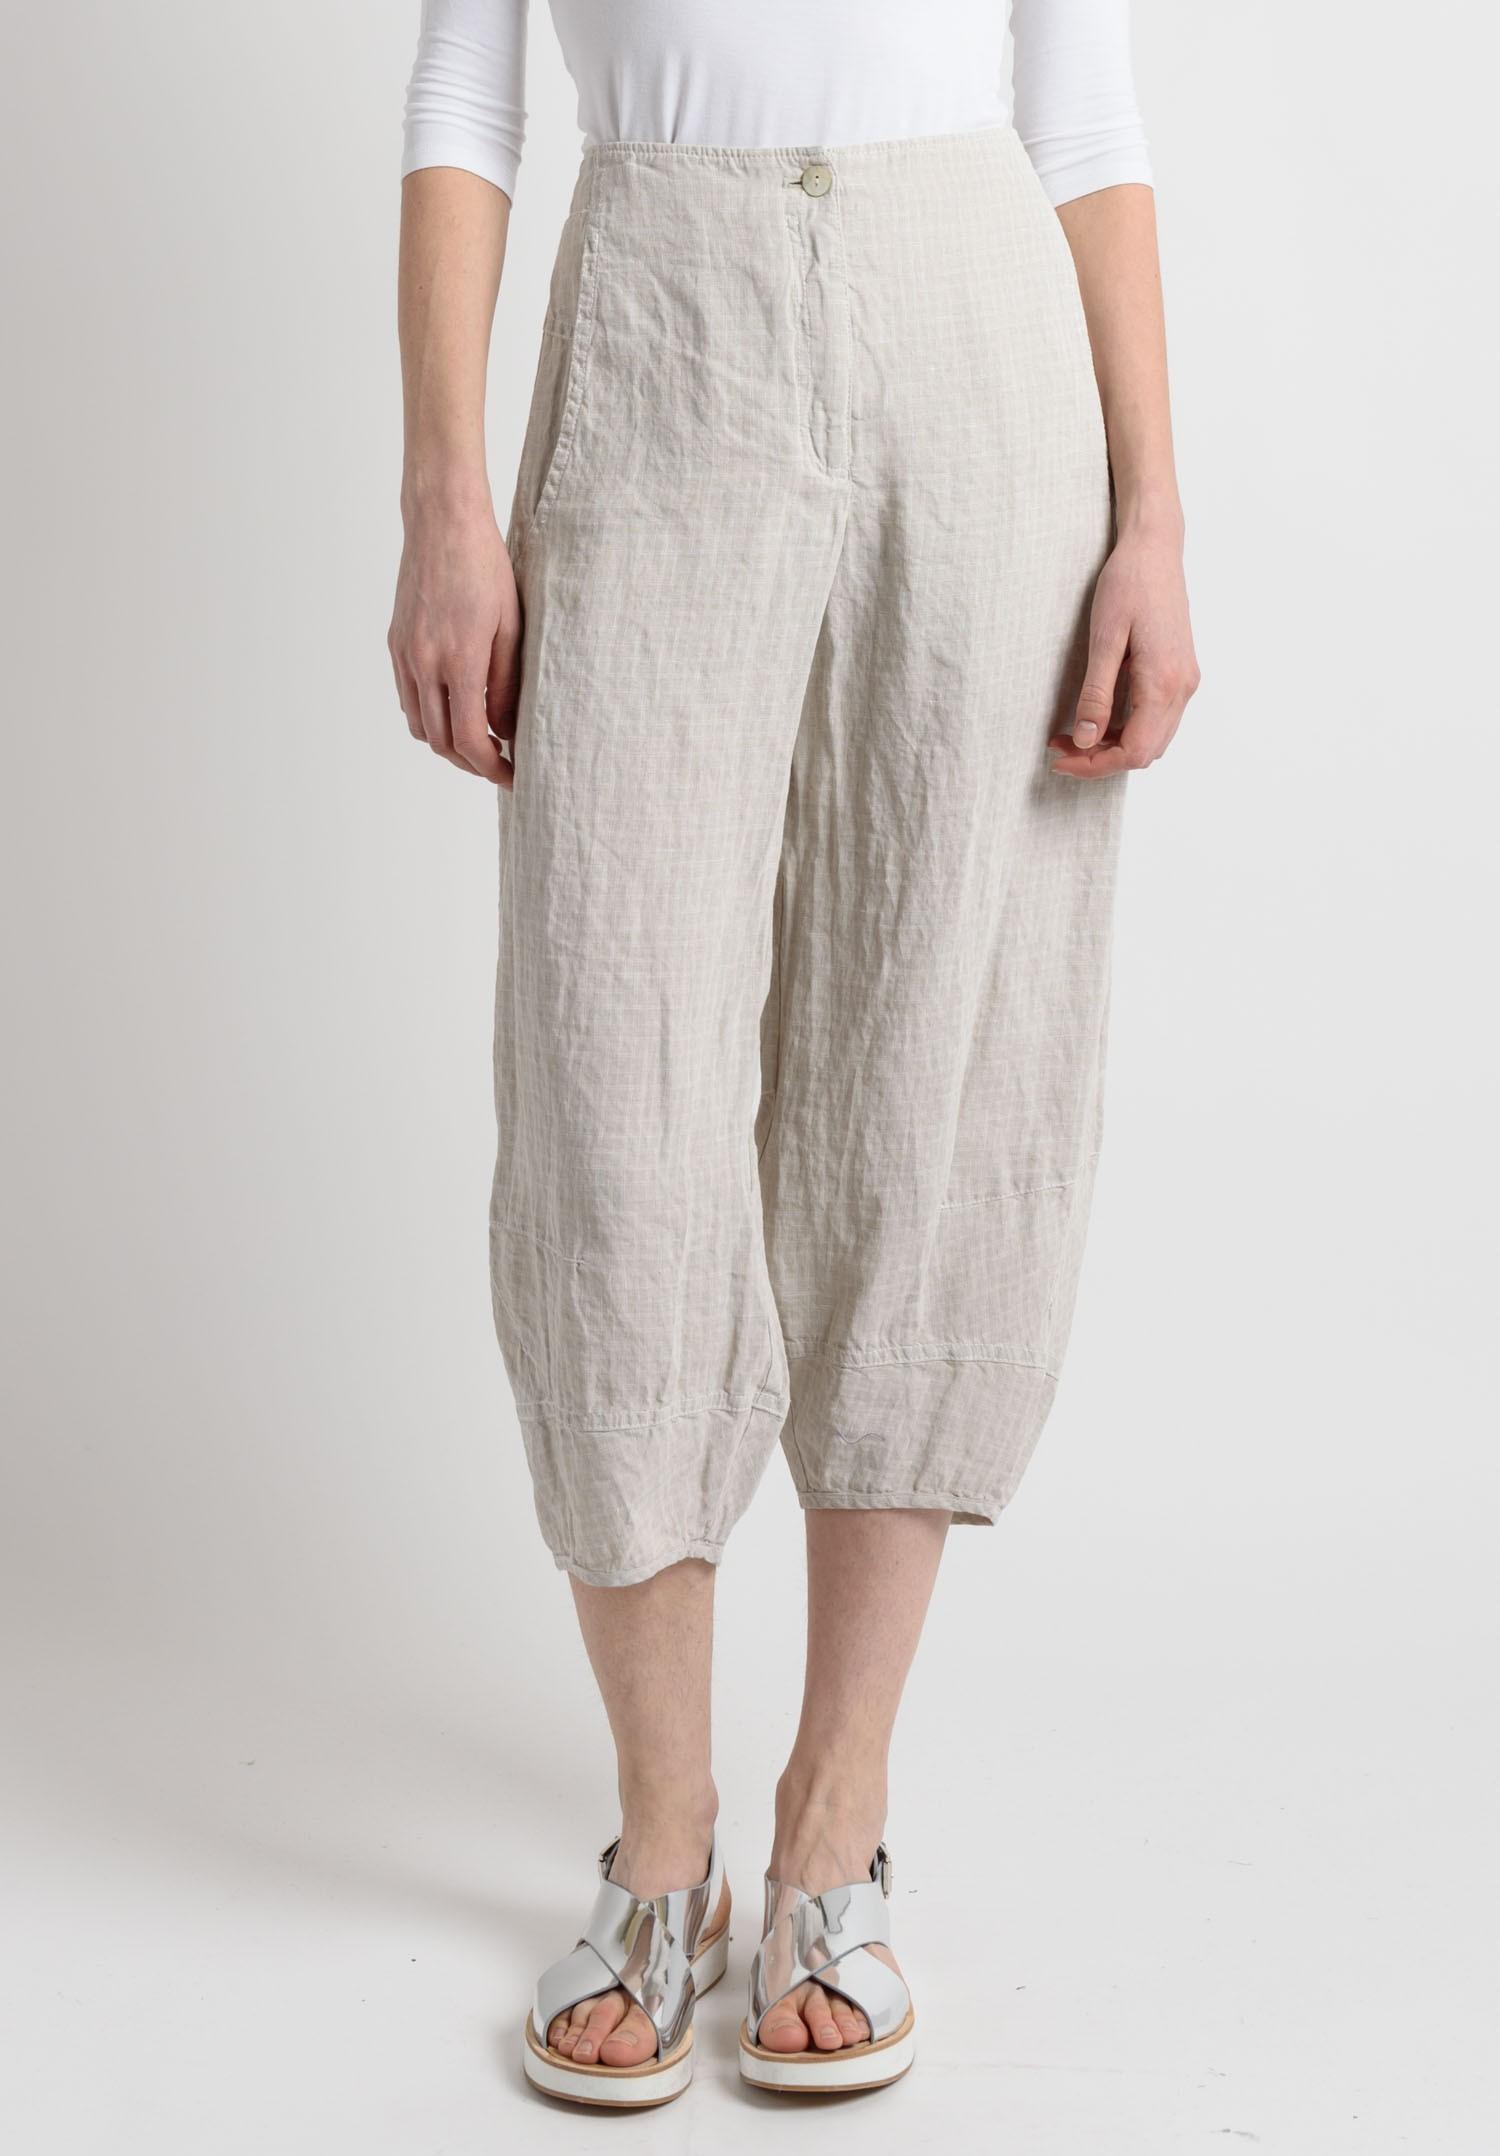 Oska Linen Jacquard Cropped Pants In Off White Santa Fe